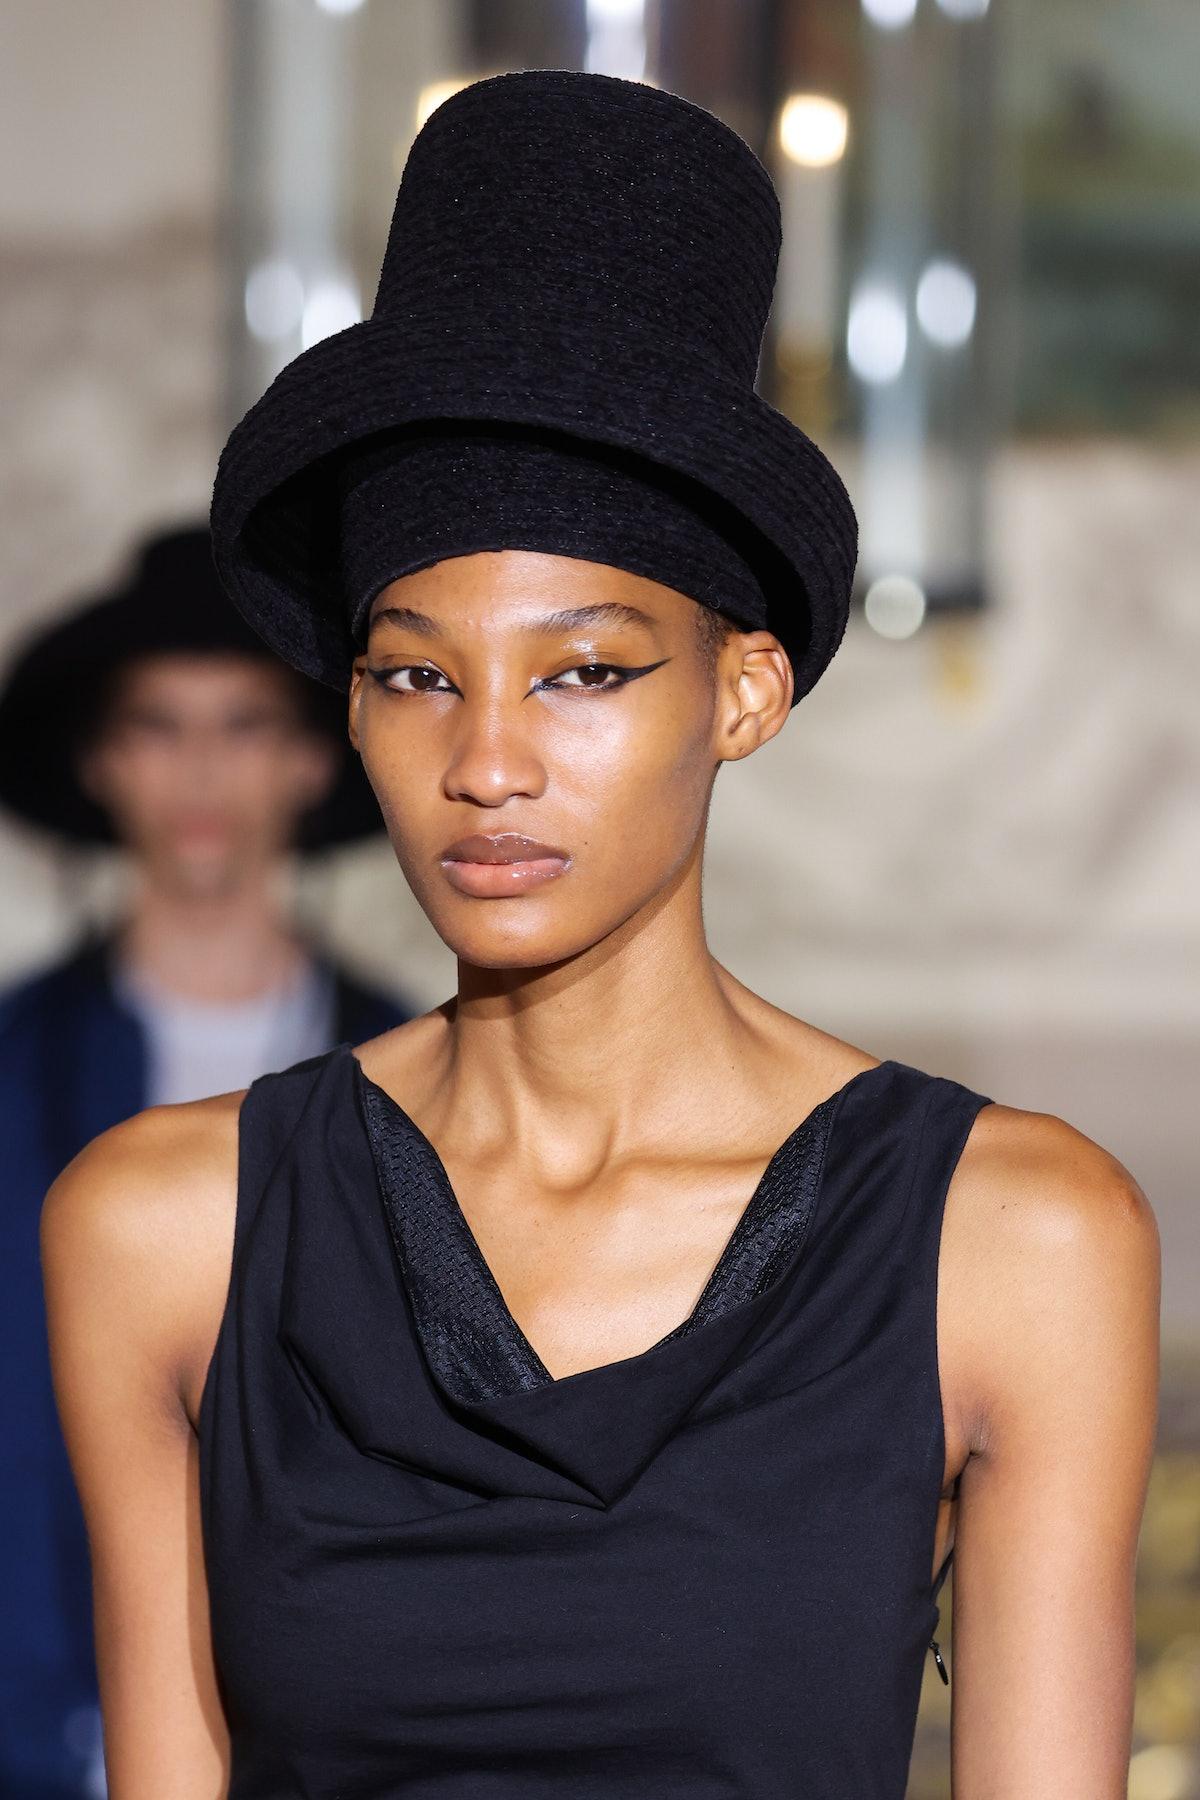 At Koché Spring Summer 2022 at Paris Fashion Week in 2021, makeup artist Cécile Paravina crafted raz...